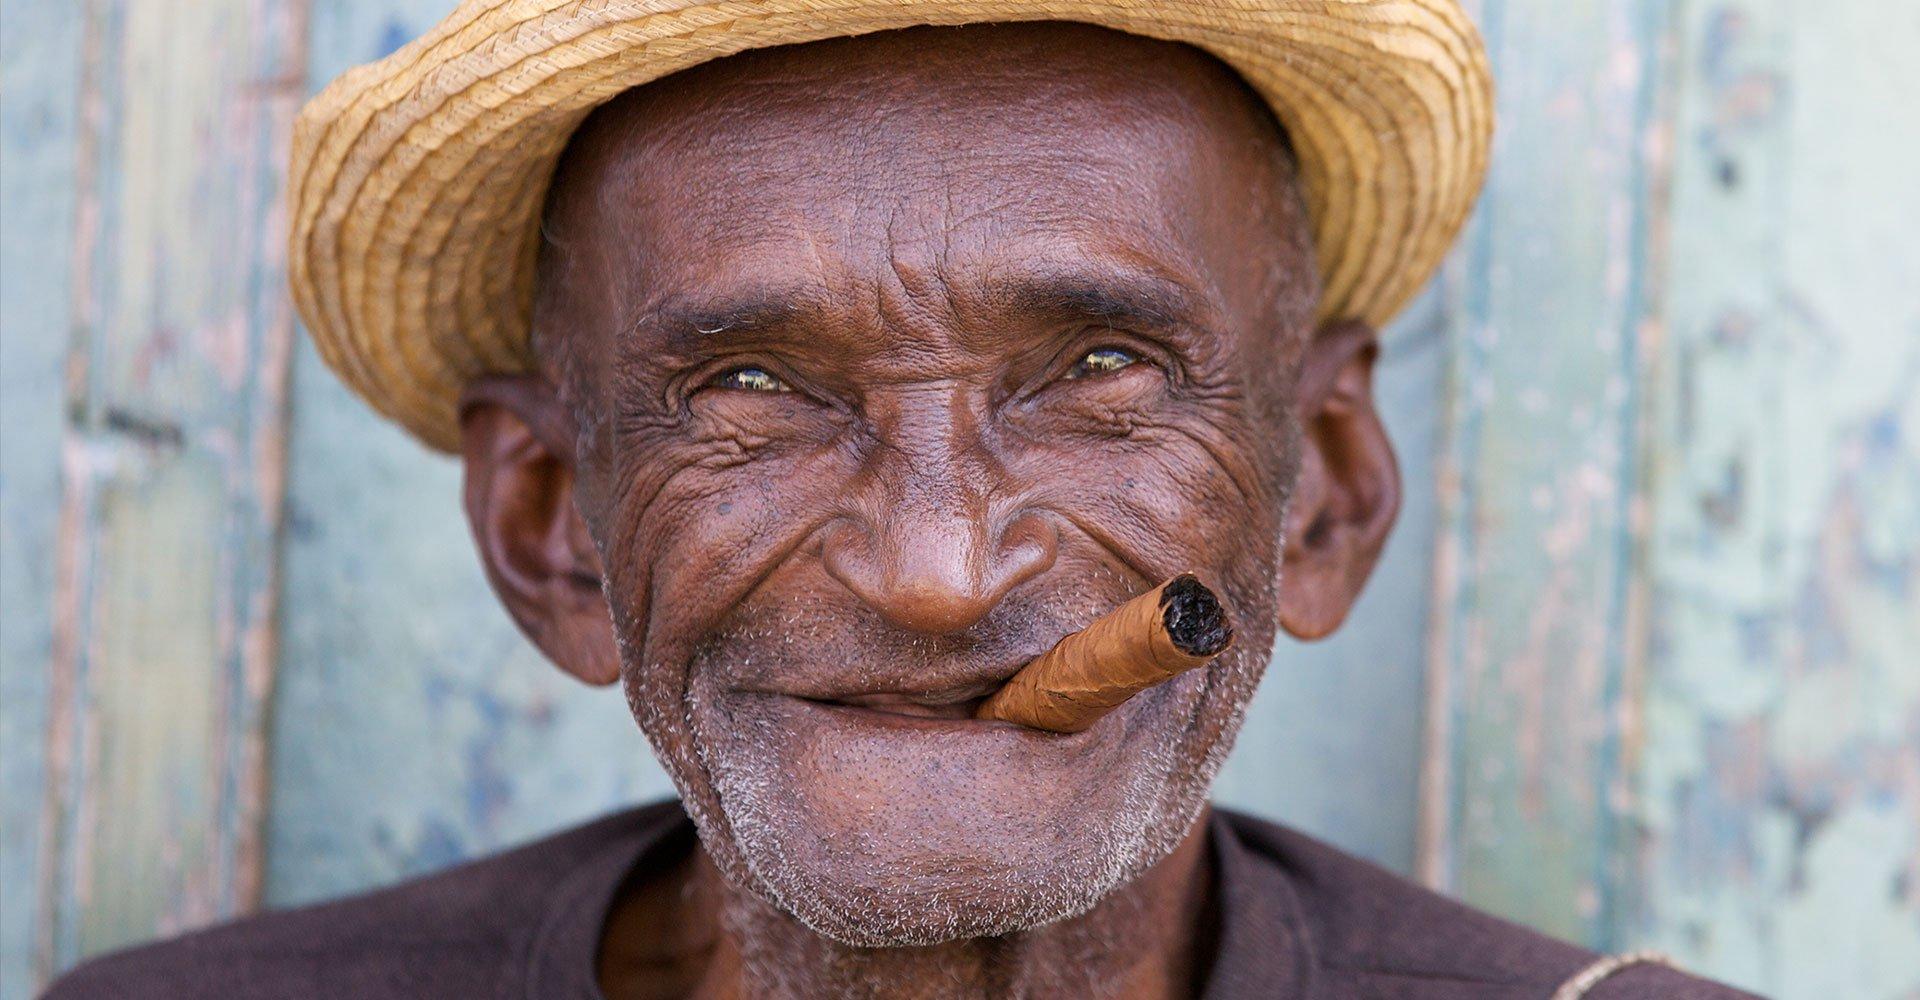 Kuba_alter Mann mit Zigarre_Cuba_Reisen